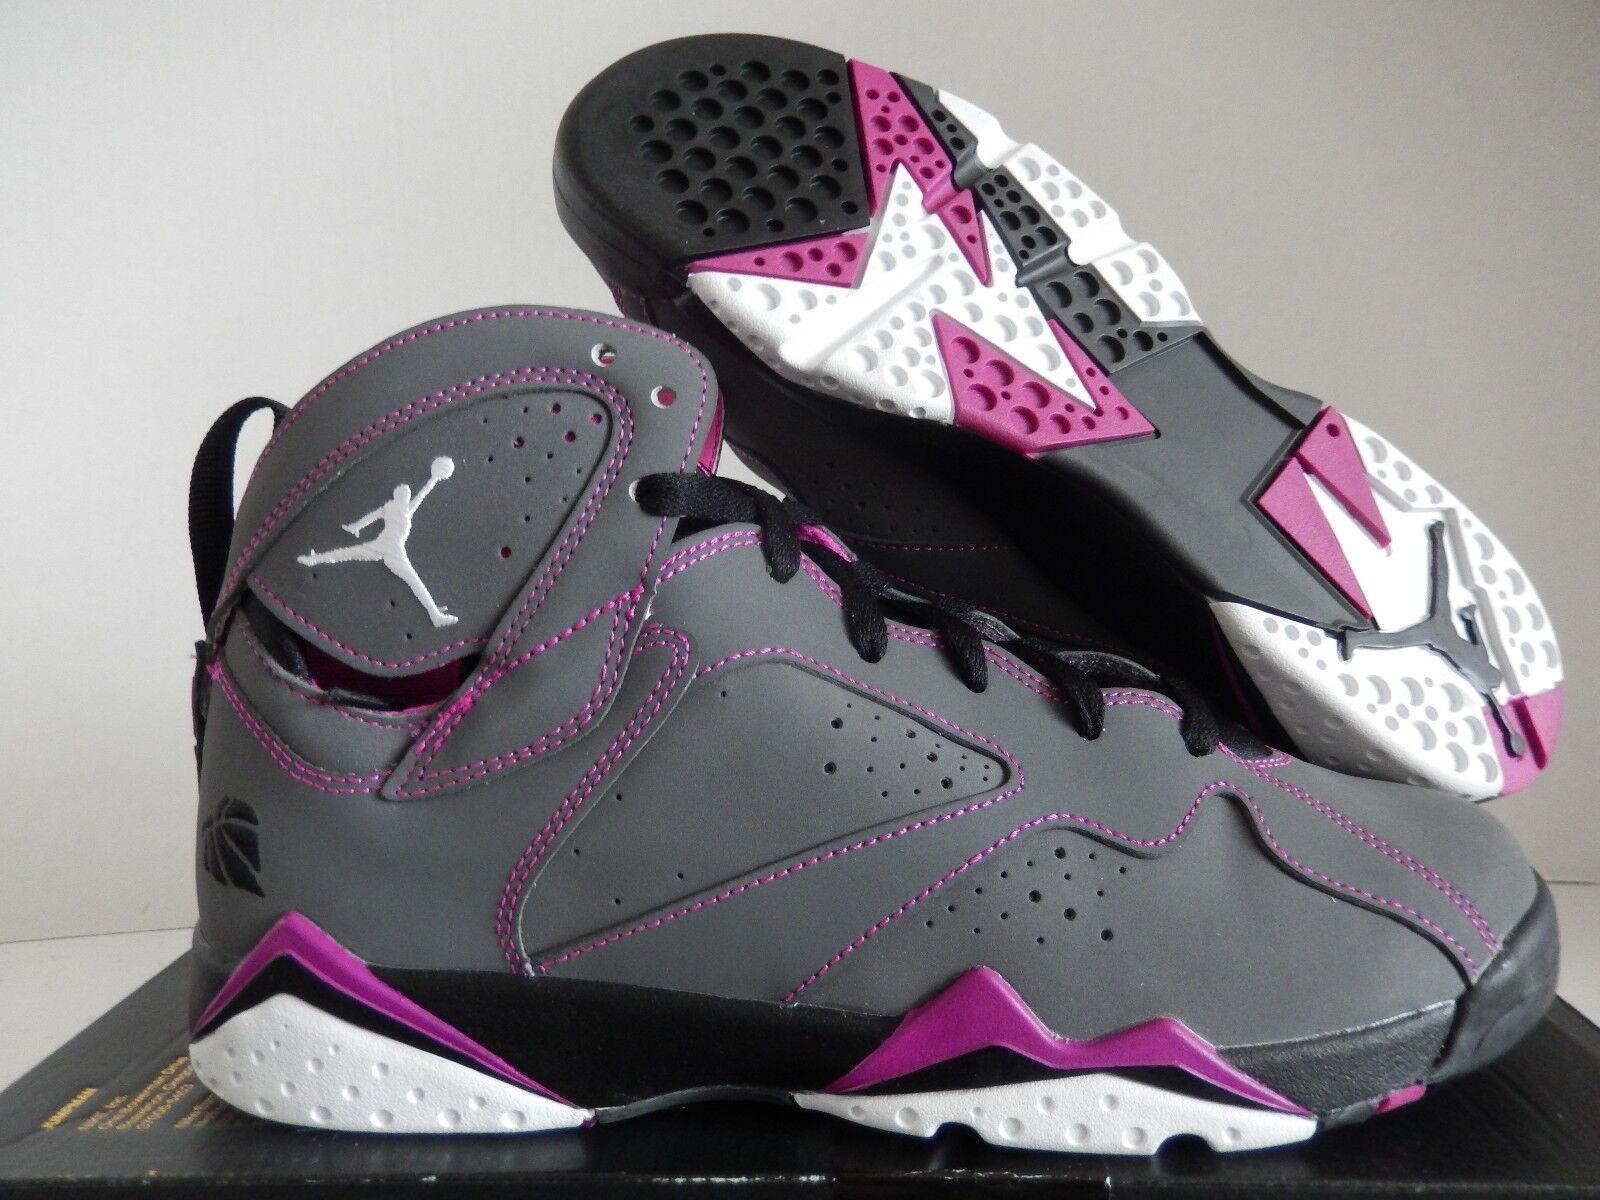 Nike air jordan 7 7 jordan '30 gg grey-white-pink sz 9y-mens sz - 9 f570f8